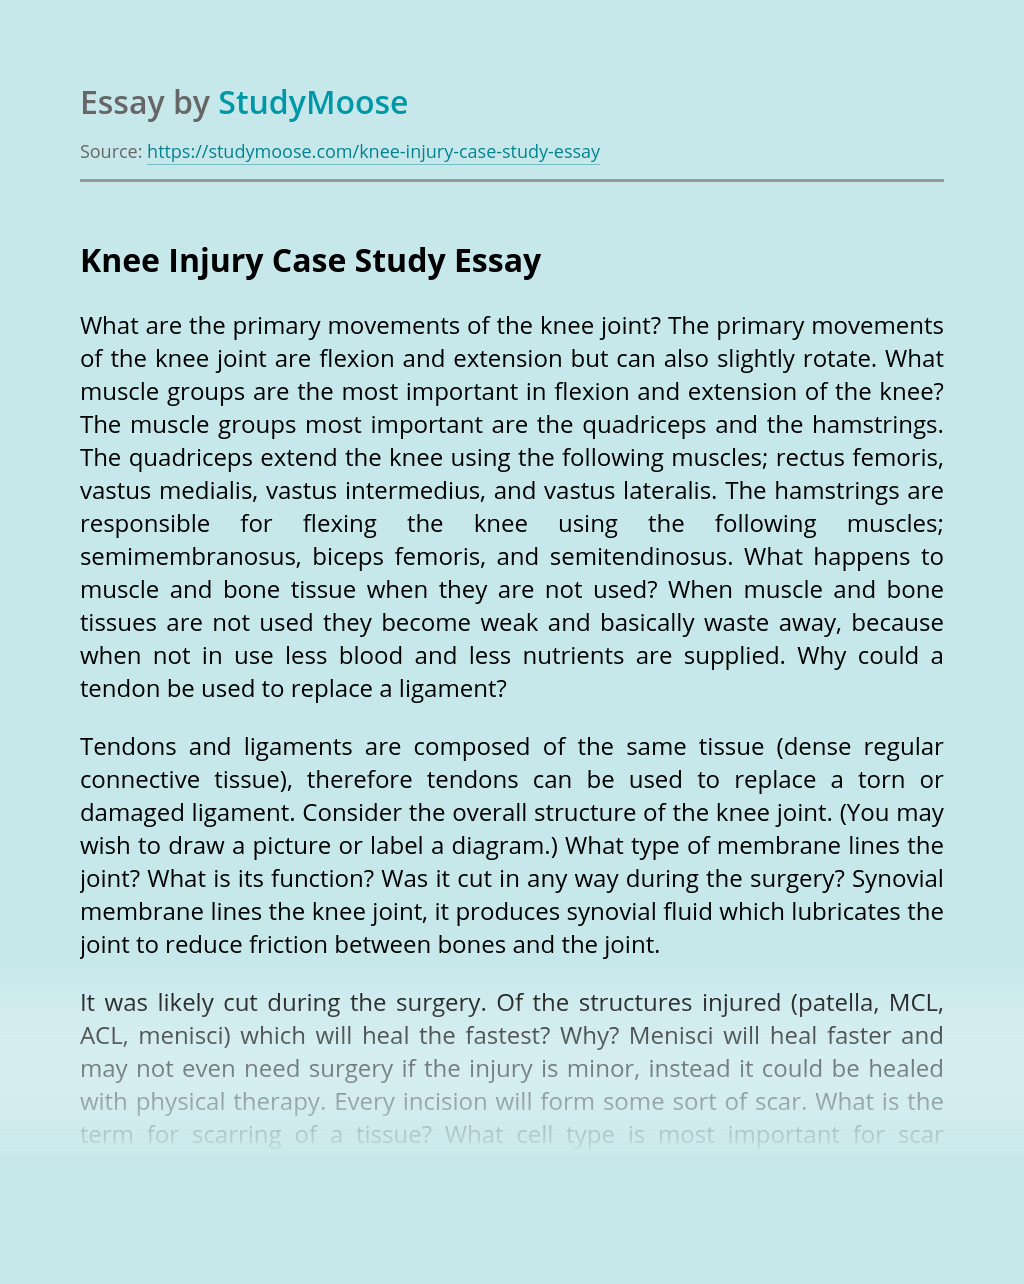 Knee Injury Case Study